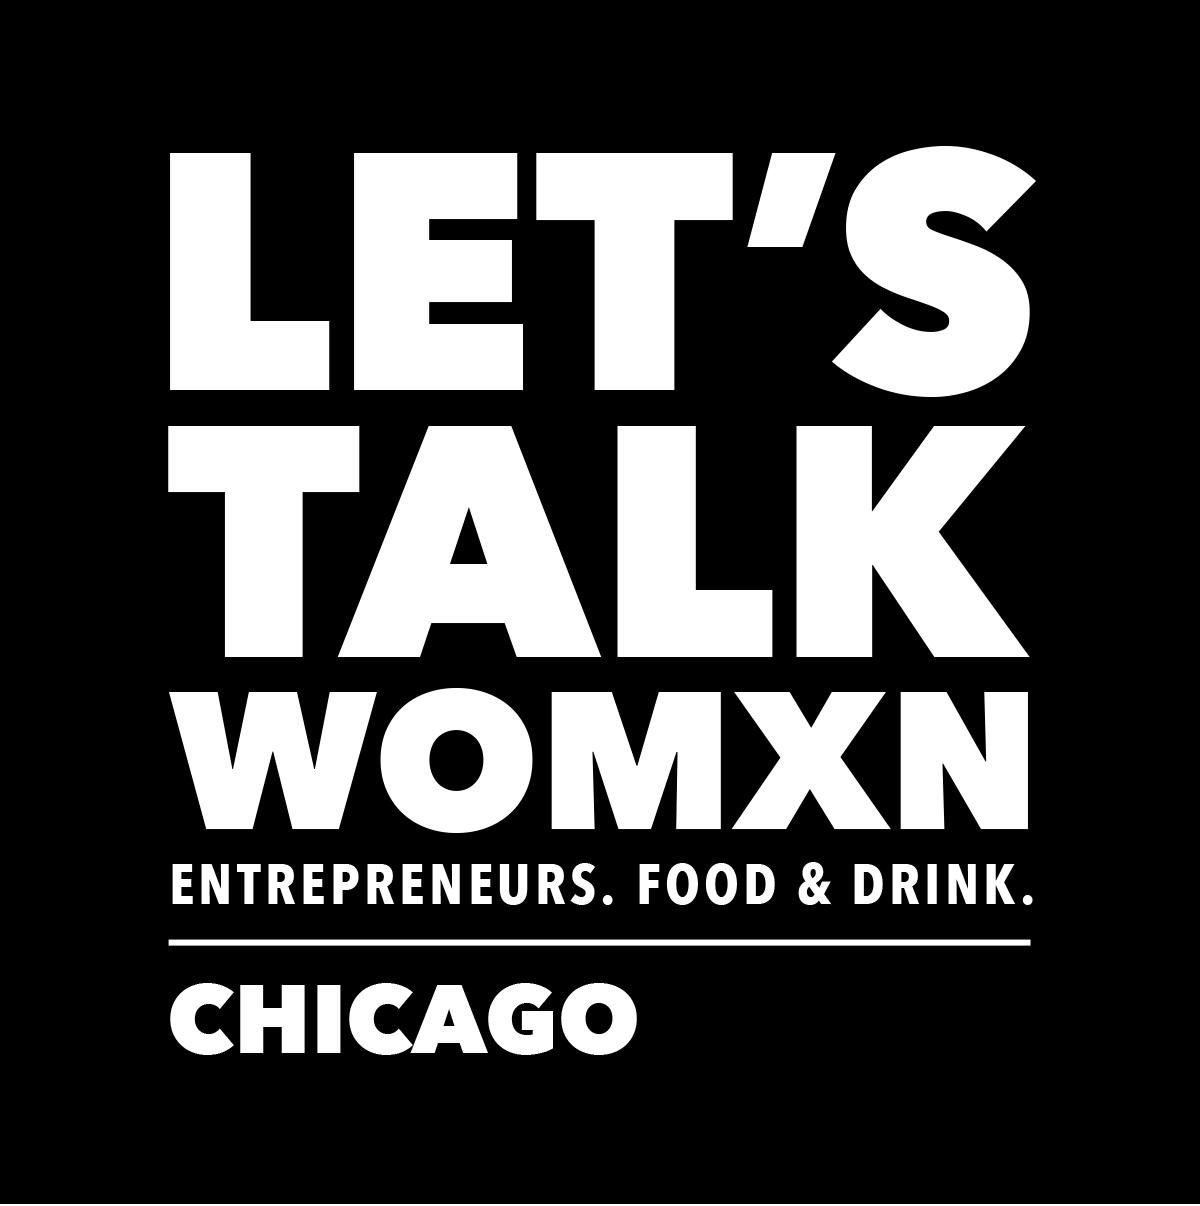 Let's Talk Womxn - Chicago